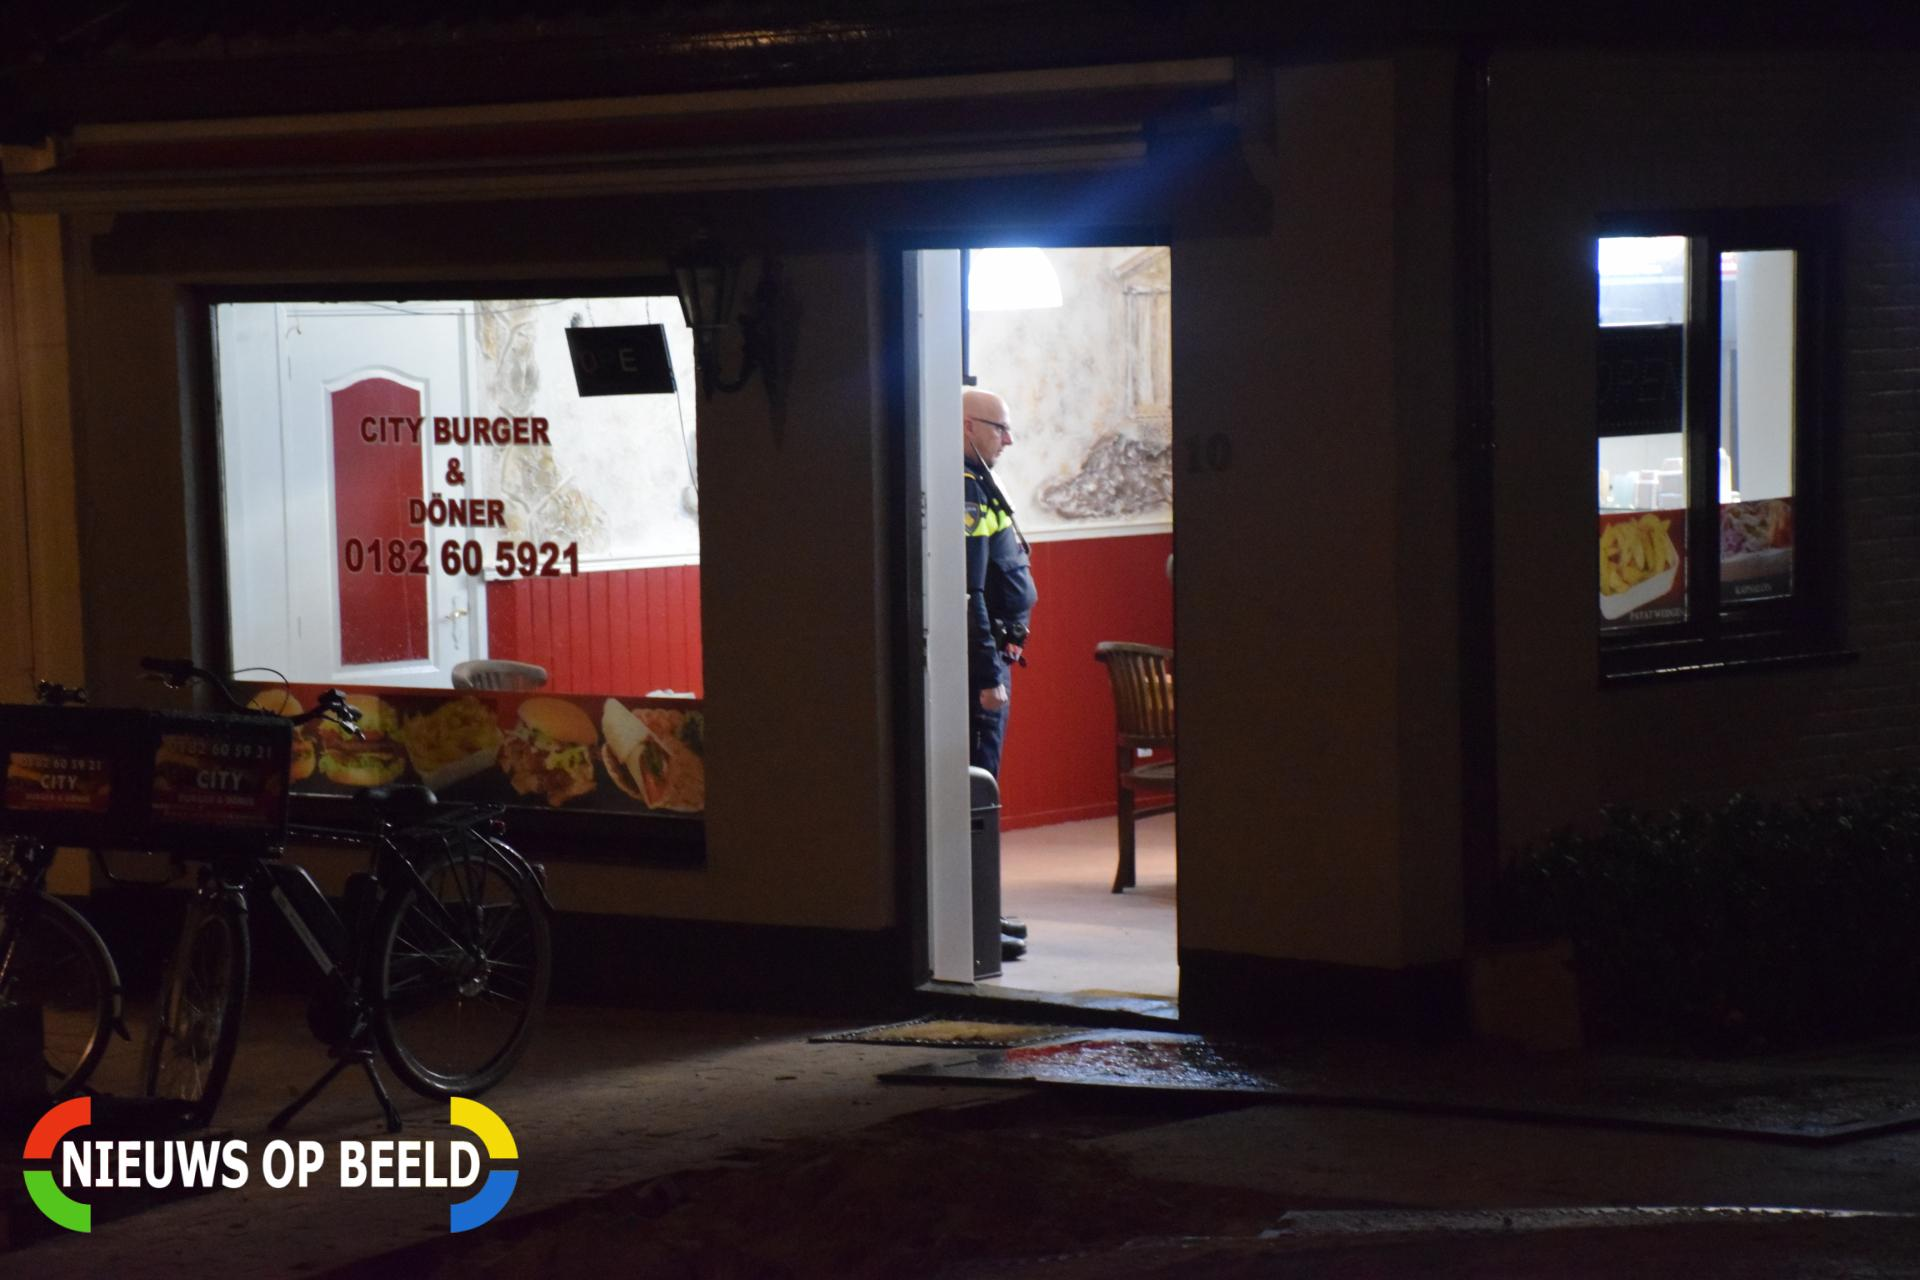 City Burger & Döner overvallen Kerkweg-West Waddinxveen